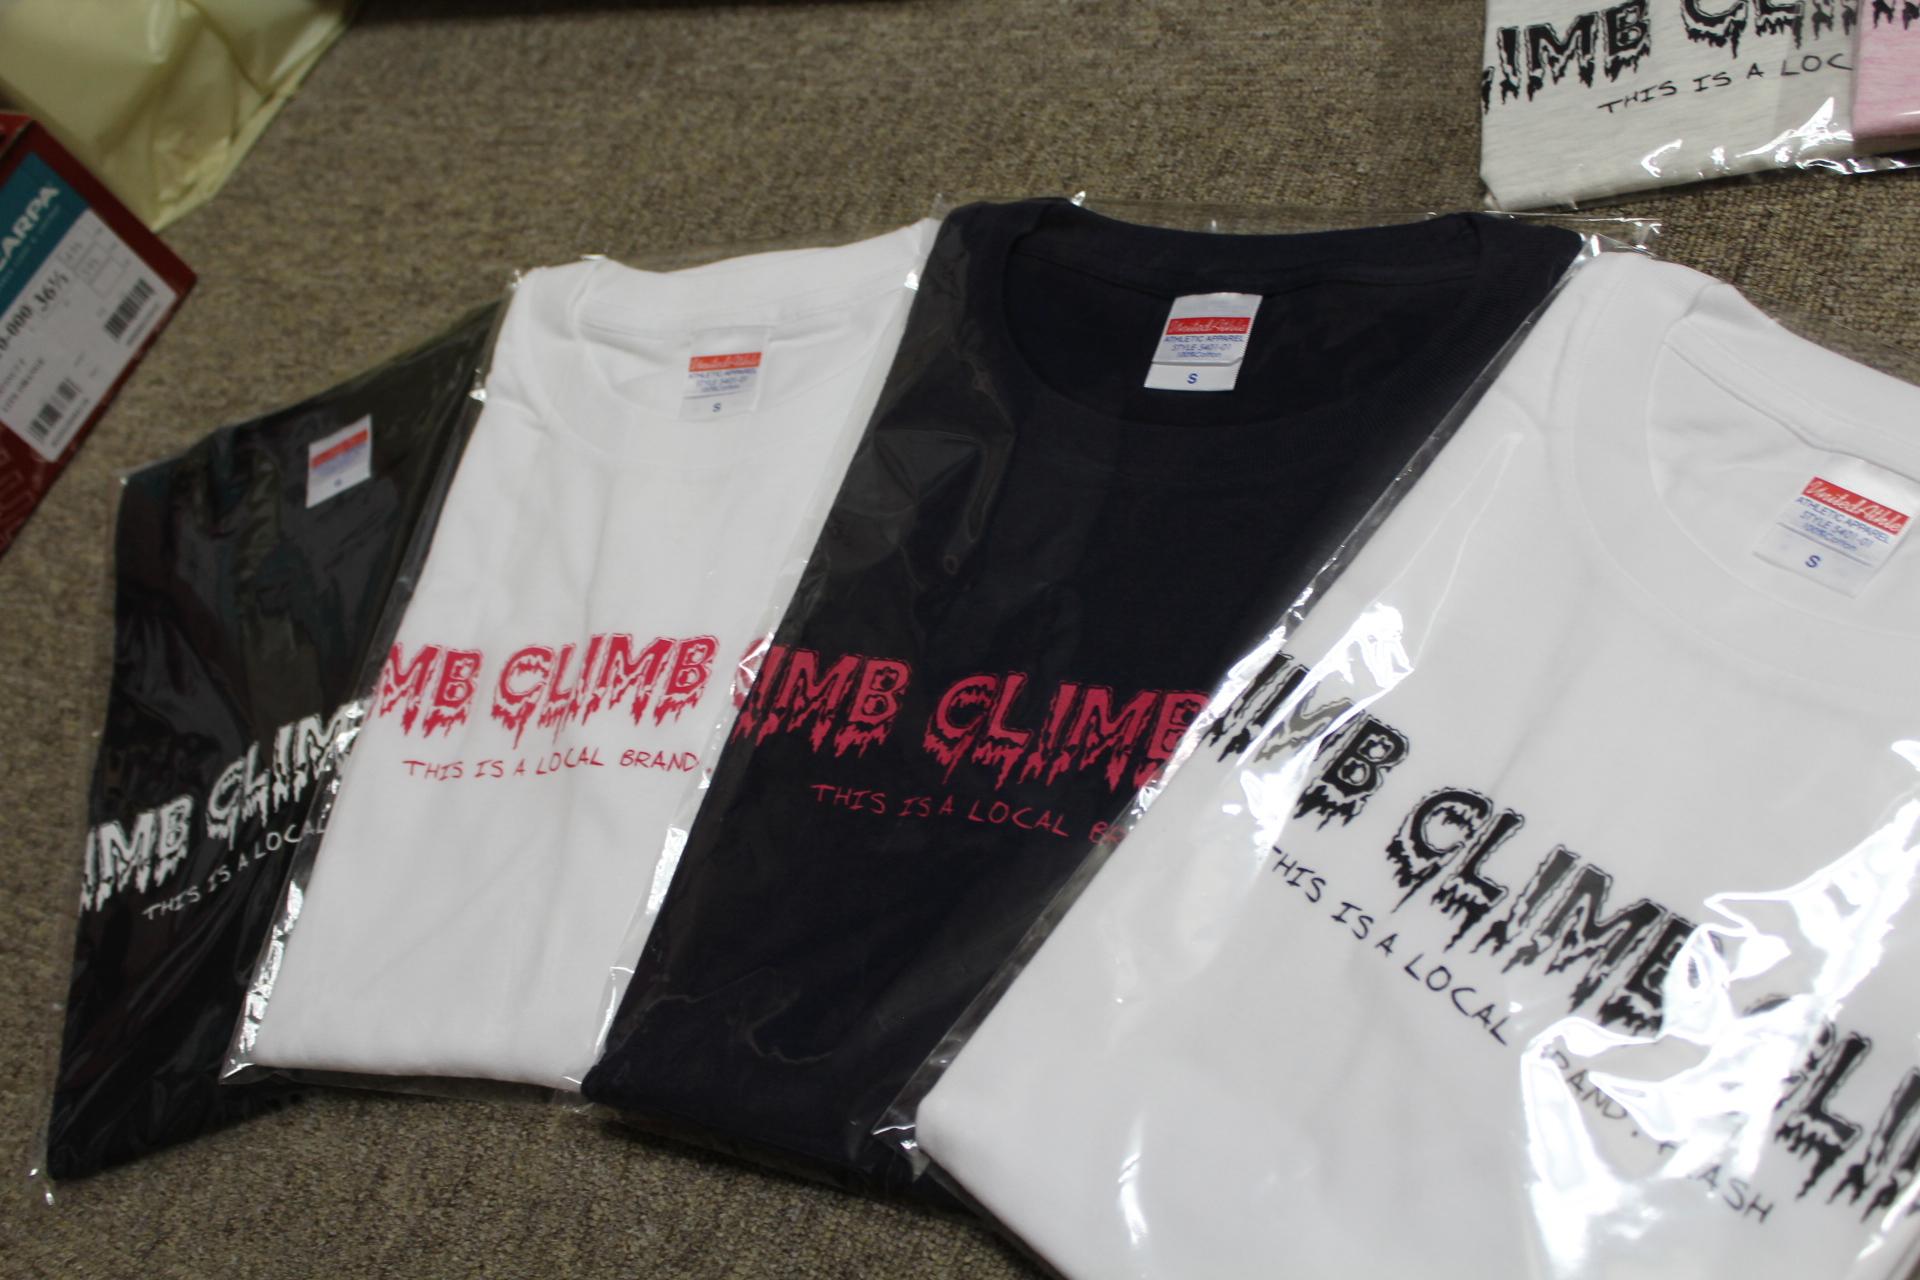 CLIMB CLIMB CLIMB!